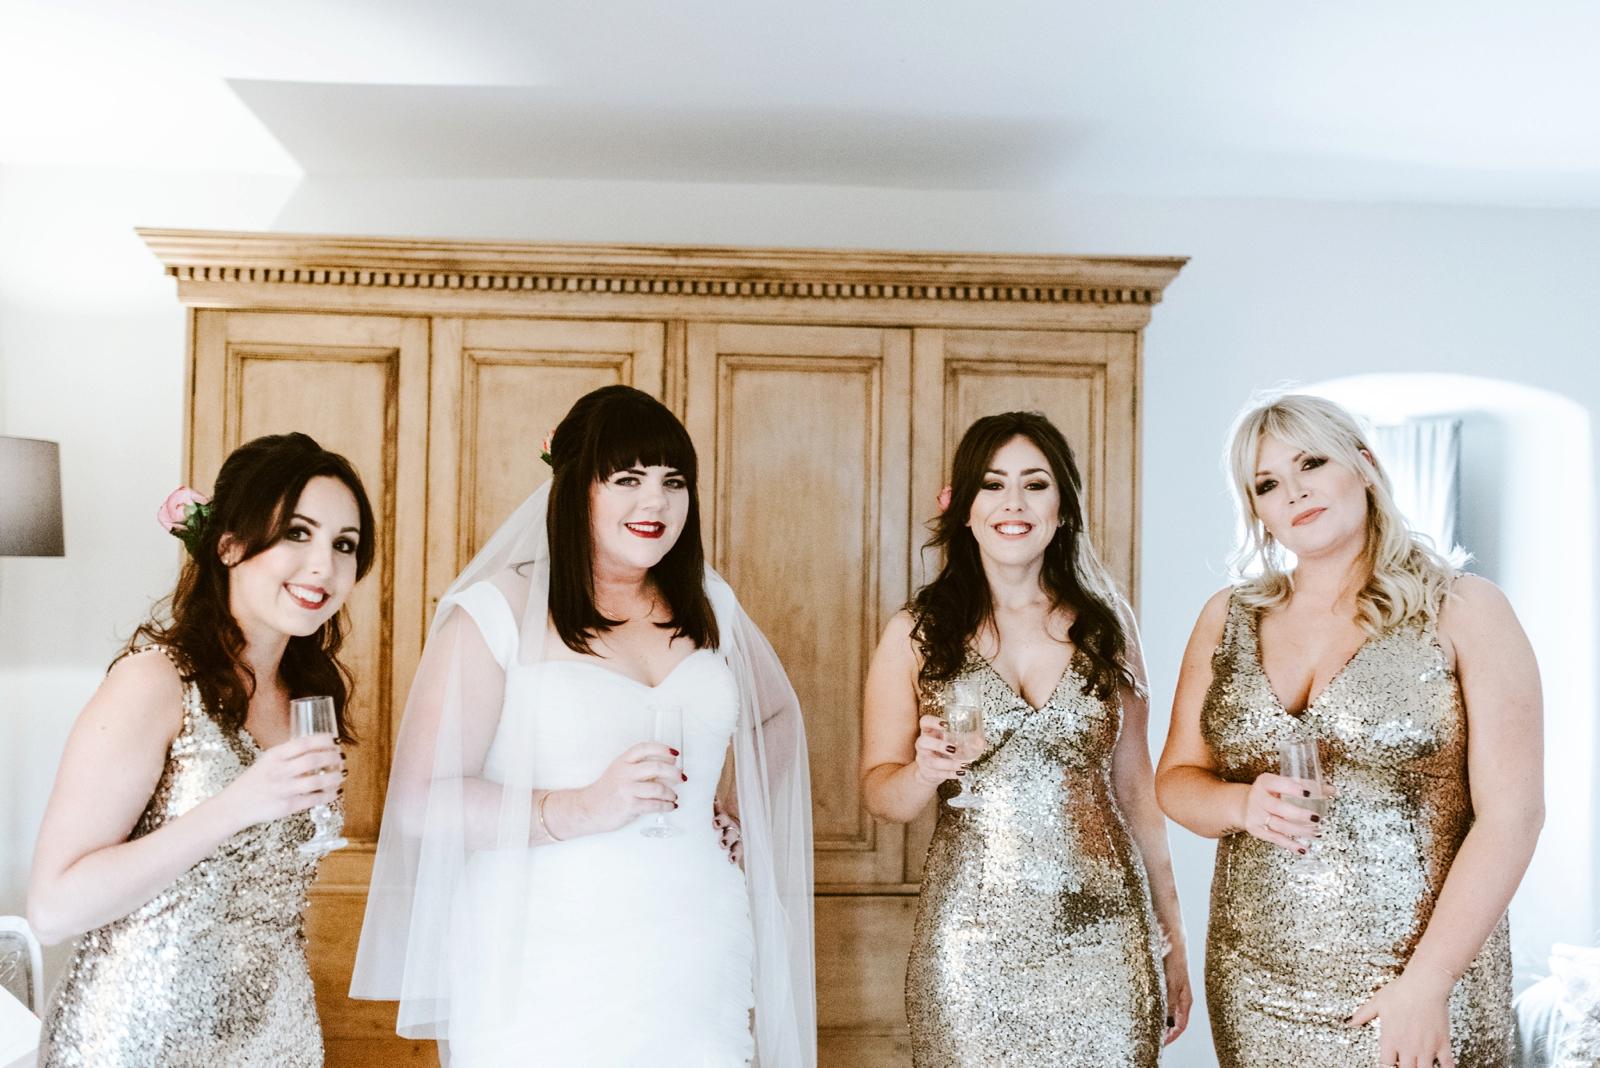 alternative-wedding-photography-scotland-katie-stephen-aikwood-tower-158.jpg